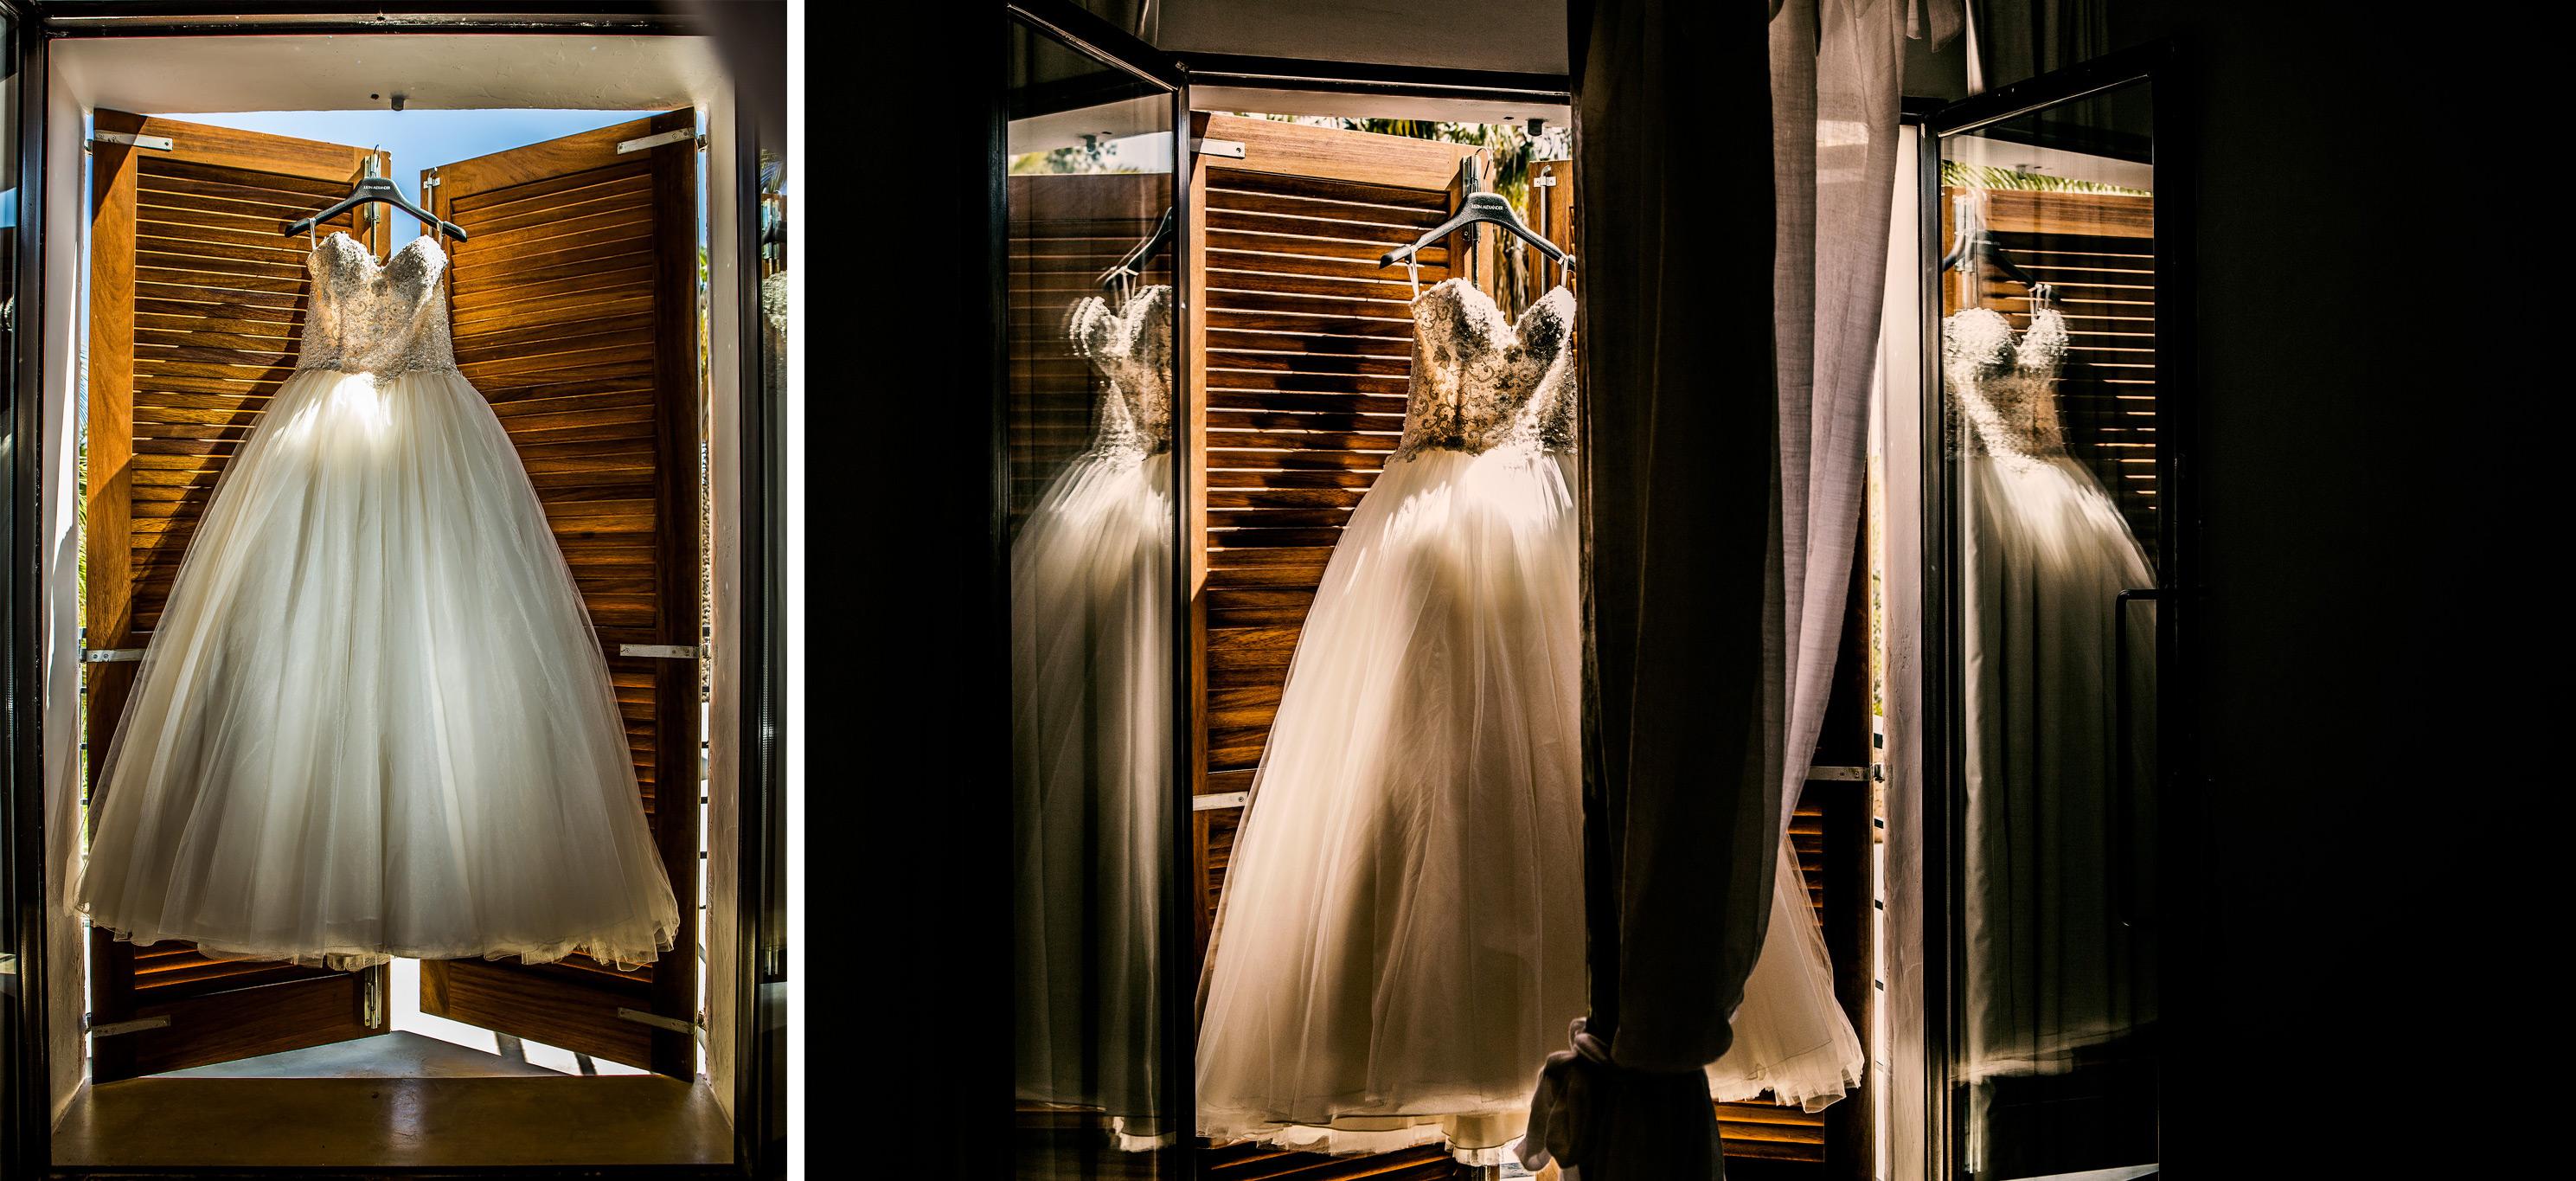 Bruidsreportage Destination Wedding Ibiza Mandy en Joost 002 - Bas Driessen Fotografie